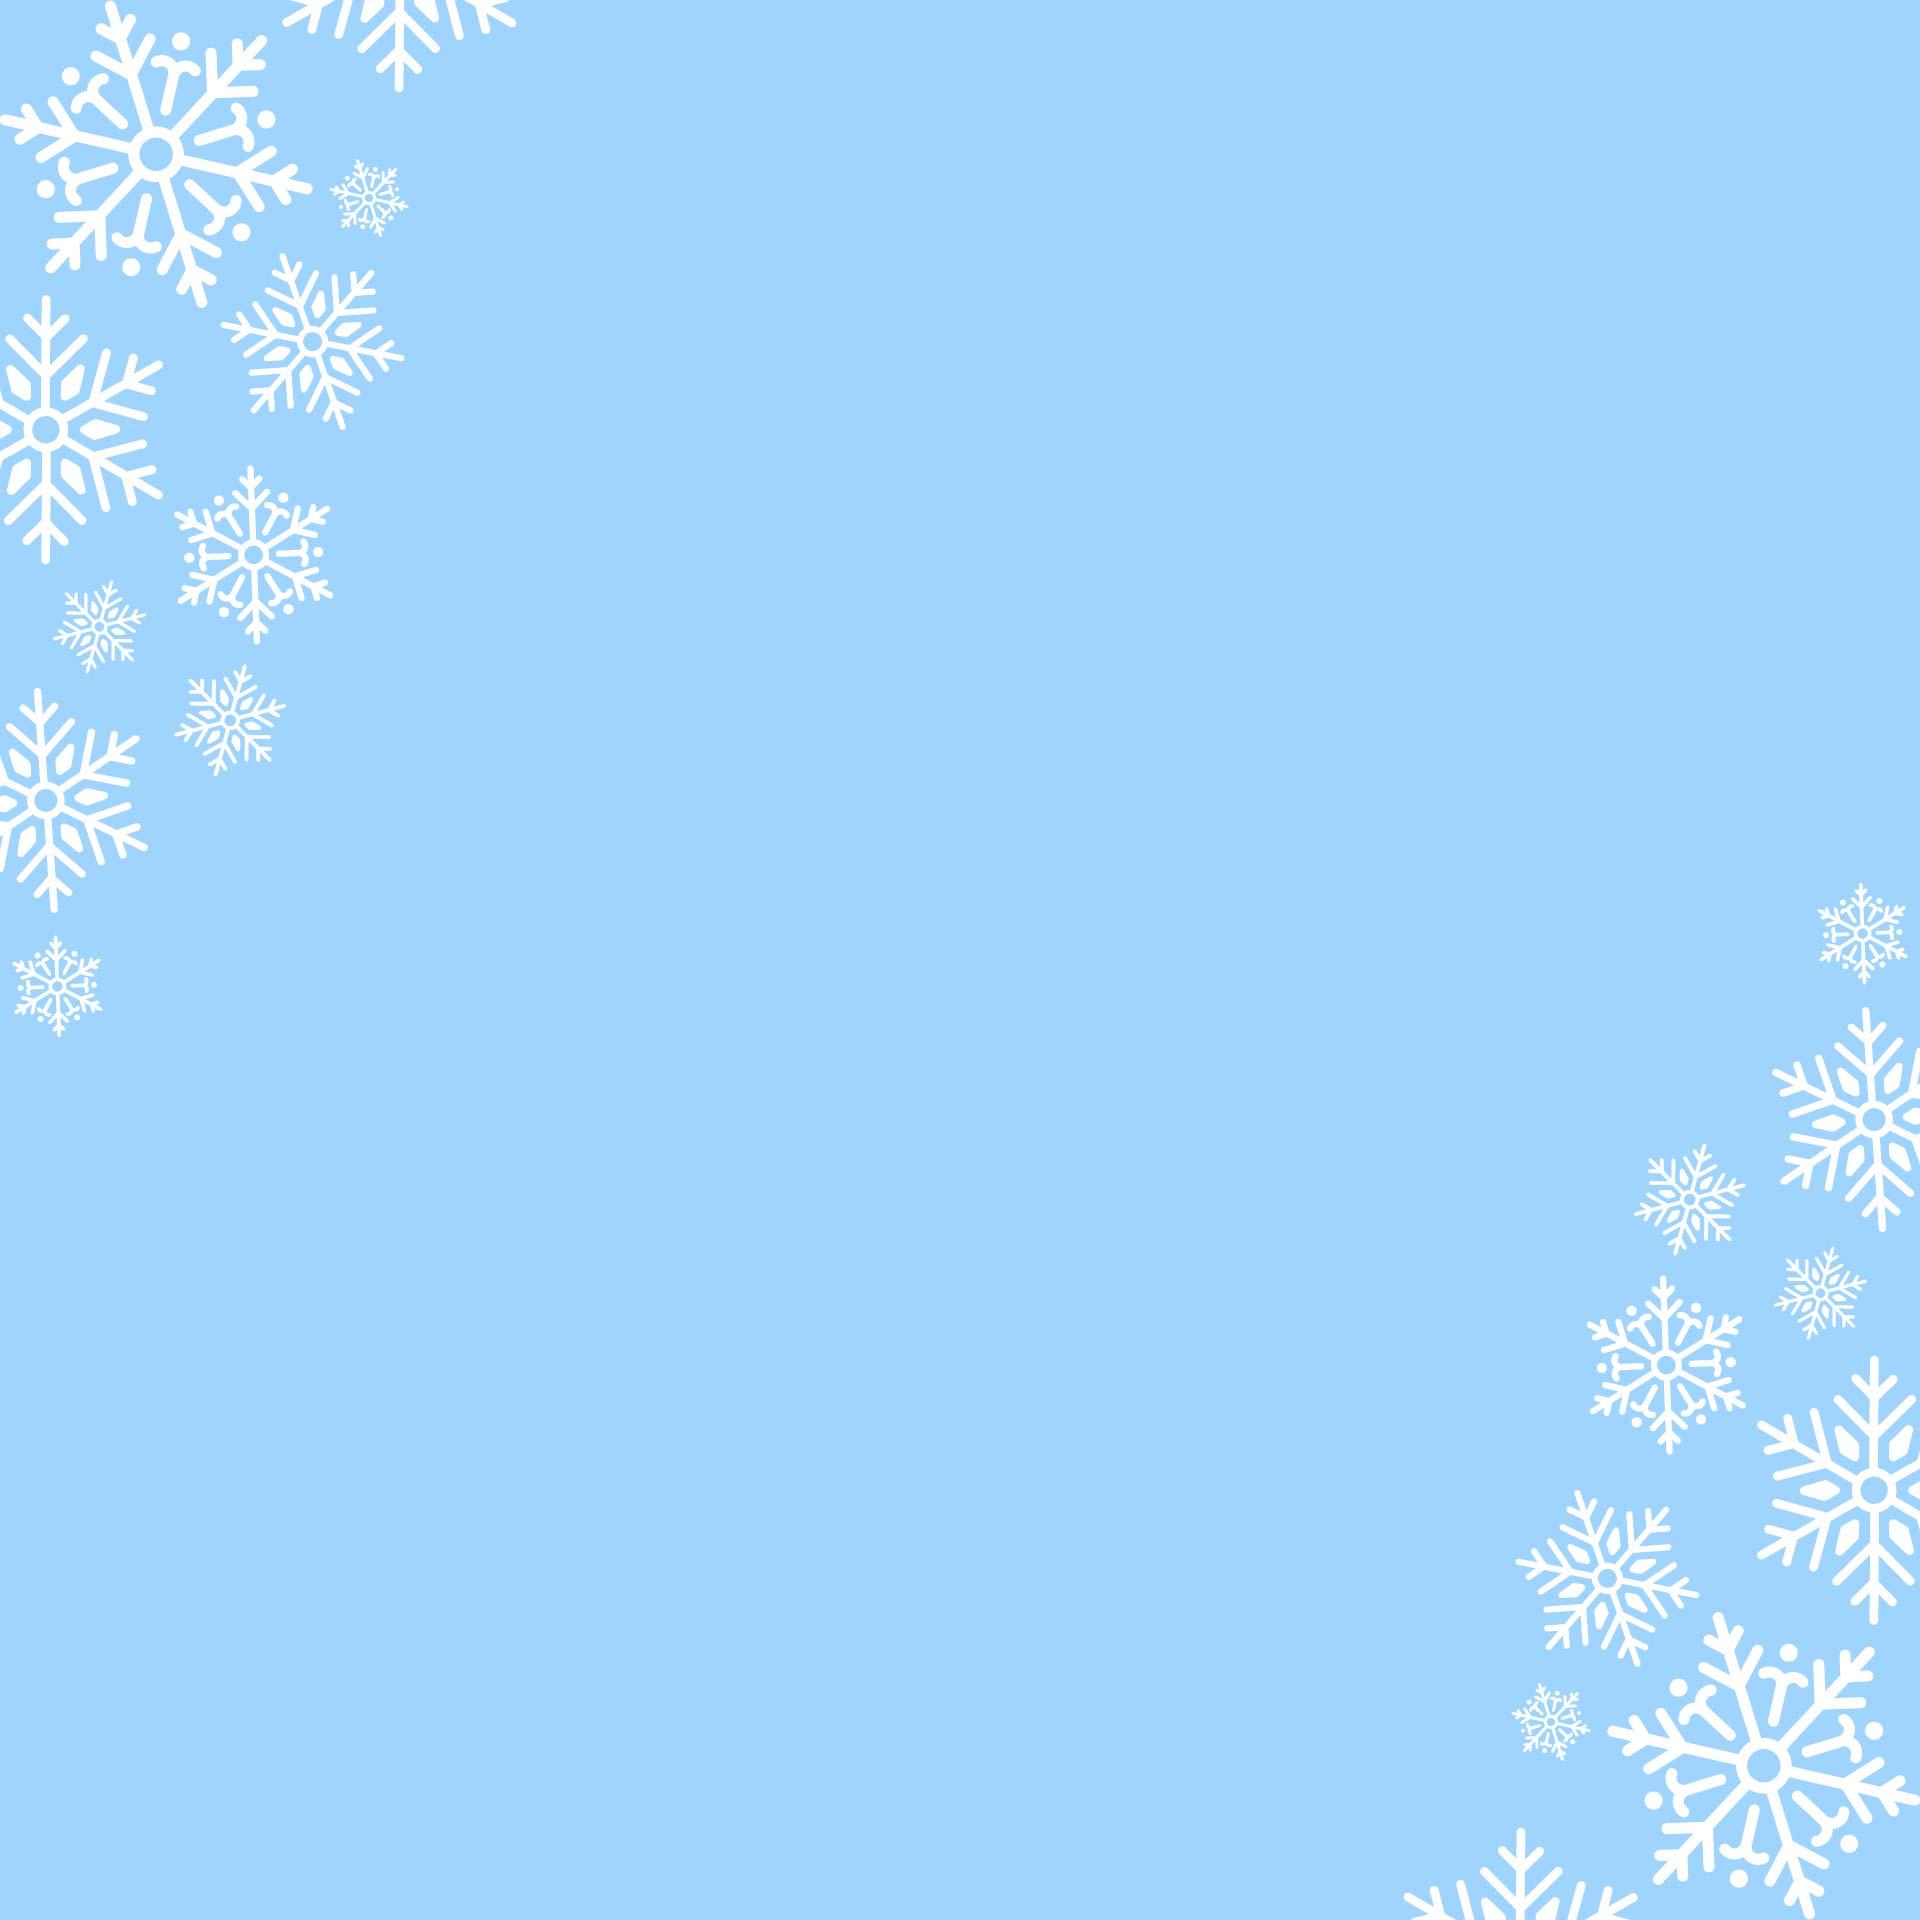 Printable Snowflake Borders